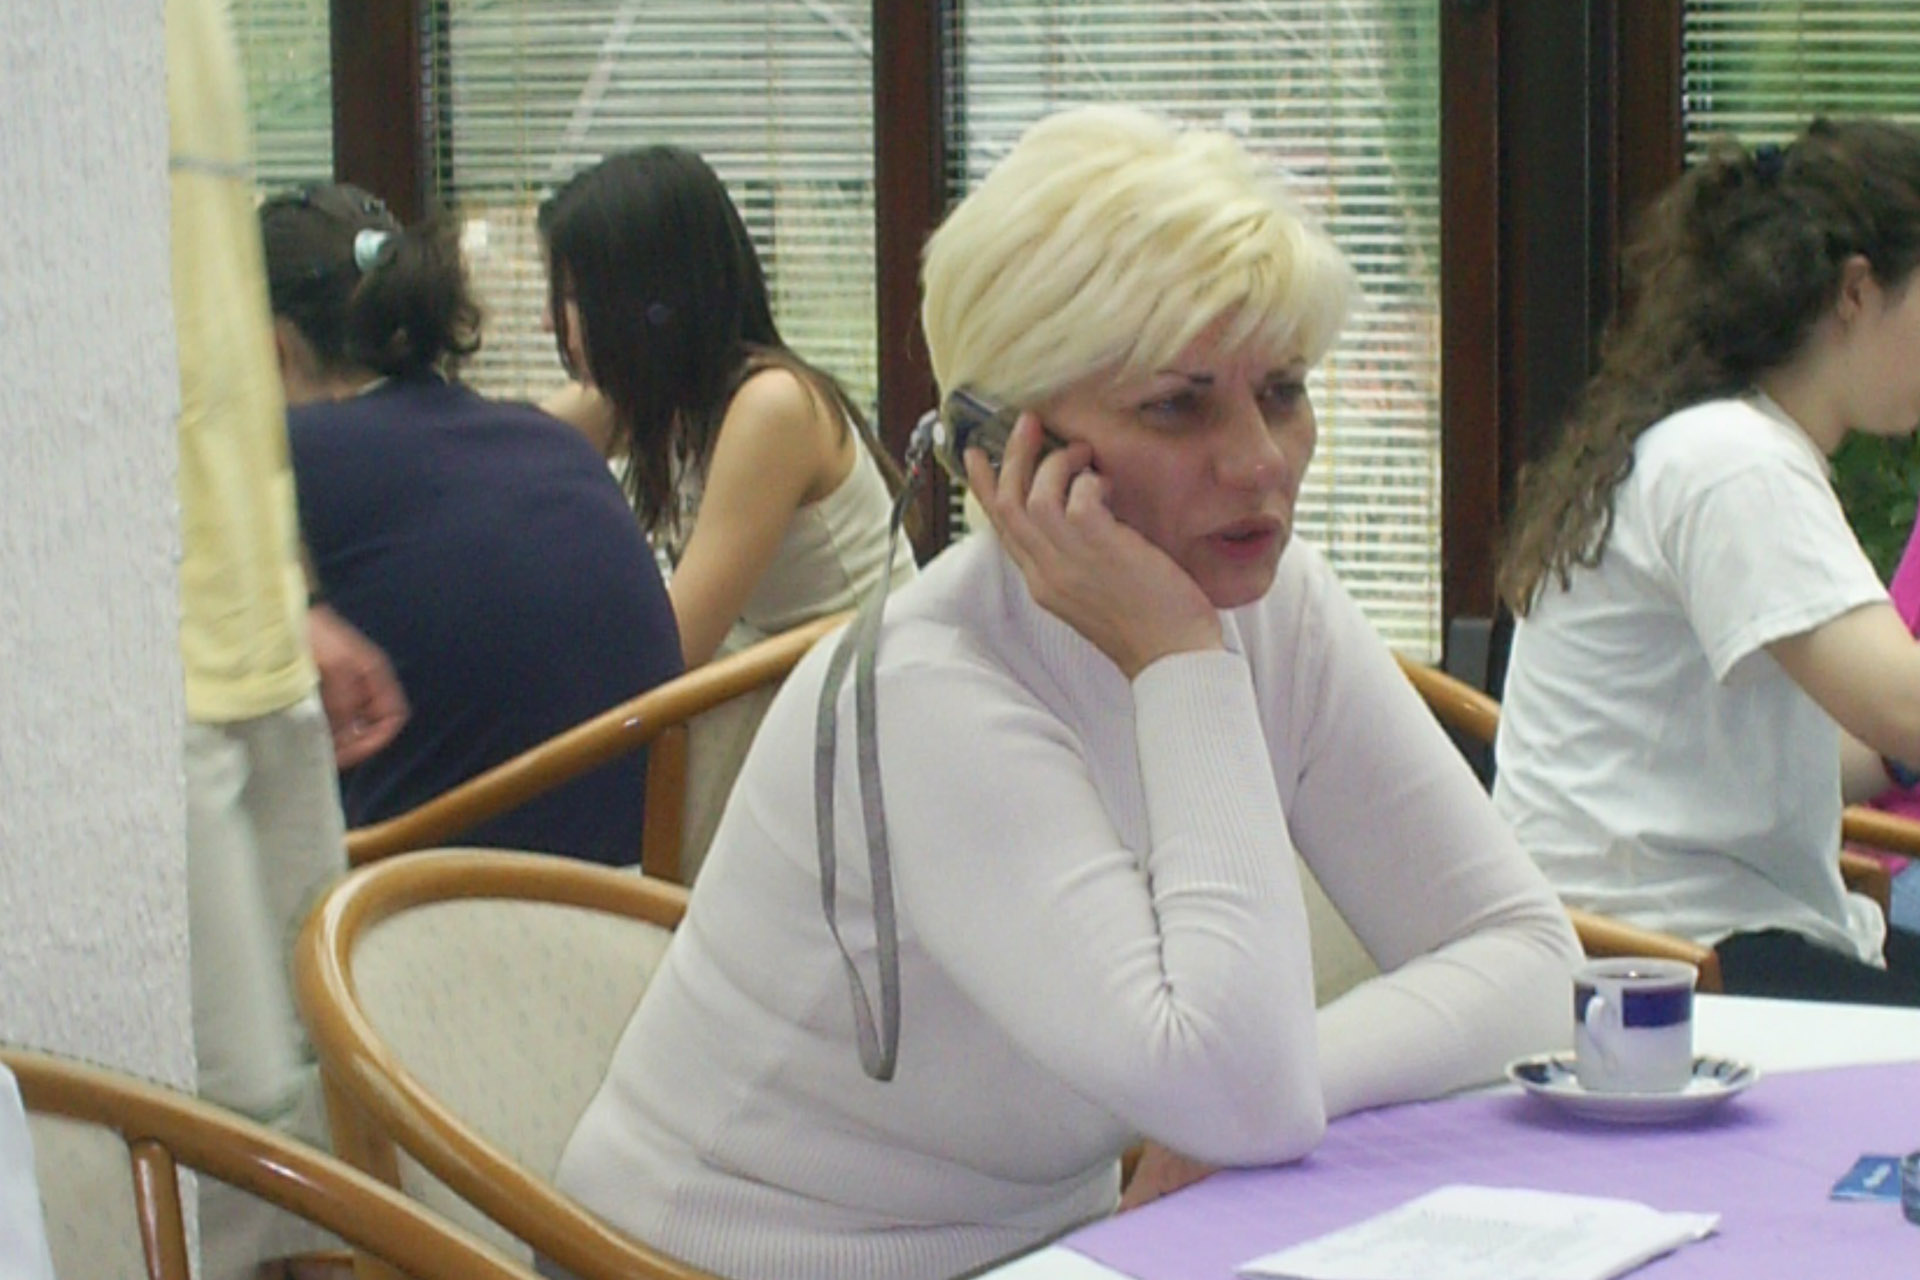 https://brankoradicevic.org.rs/wp-content/uploads/2019/04/Jadranka-Ravic-predsednik.jpg